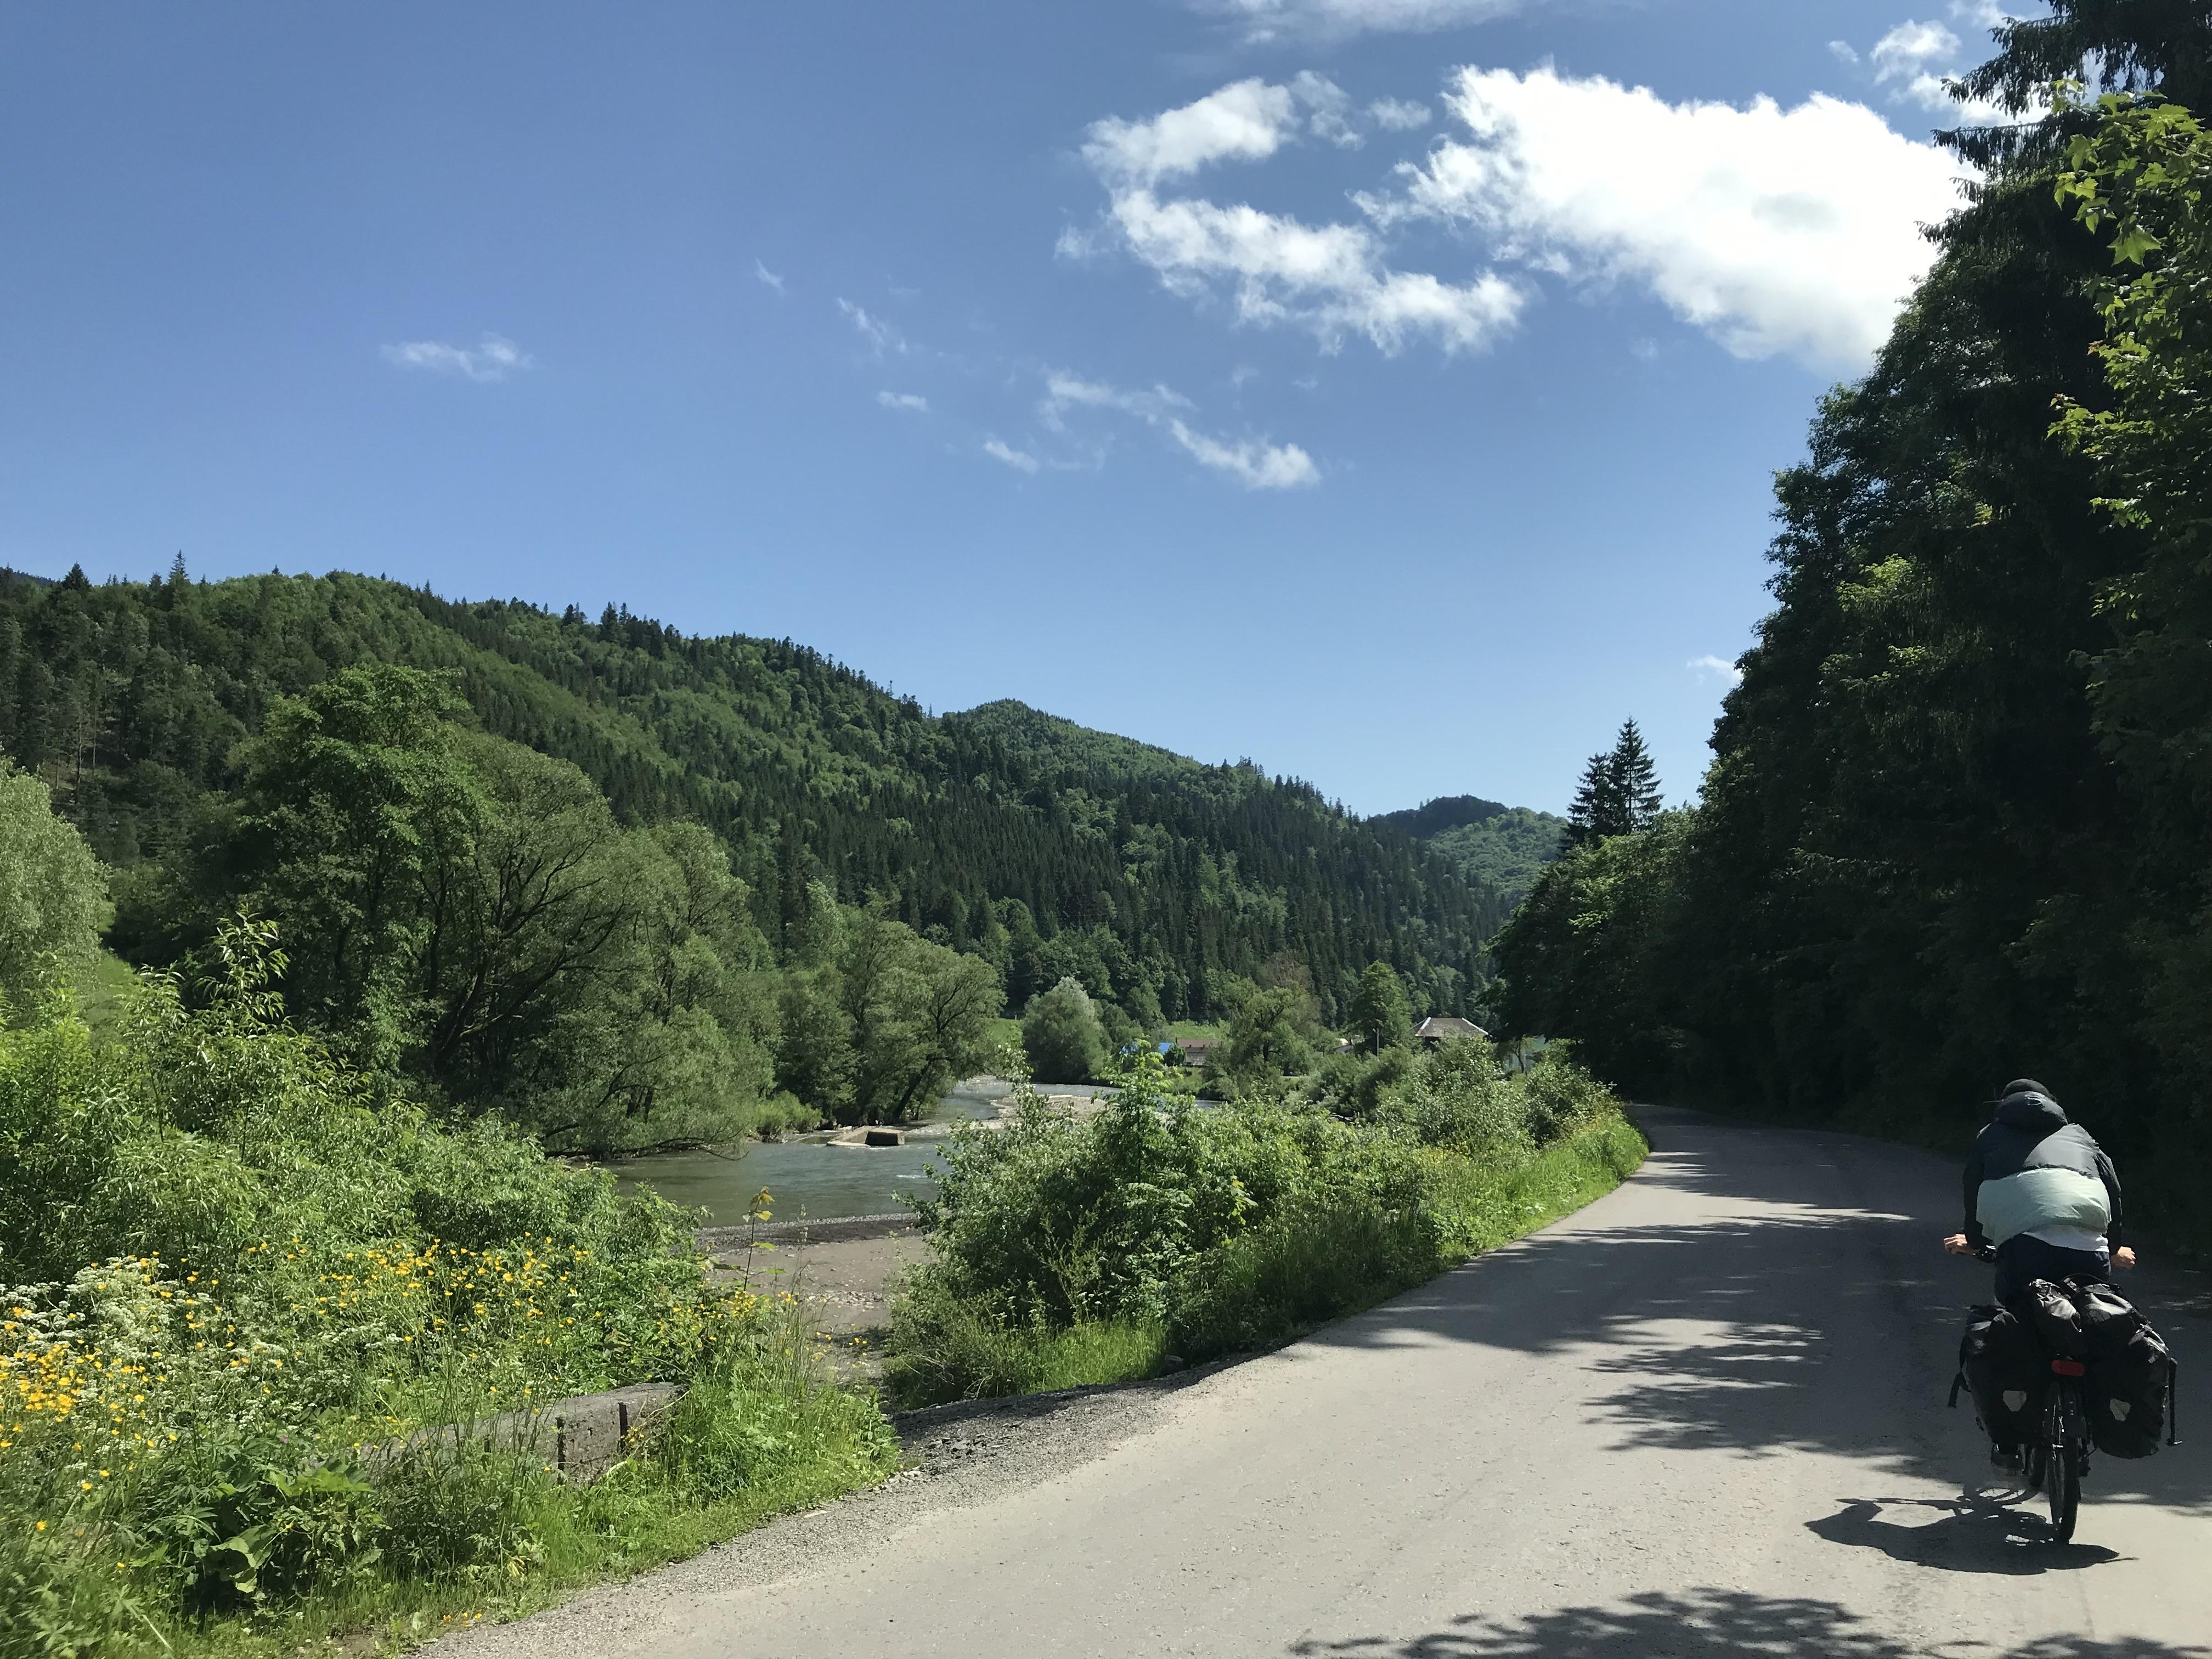 Route entlang einem Flussbett